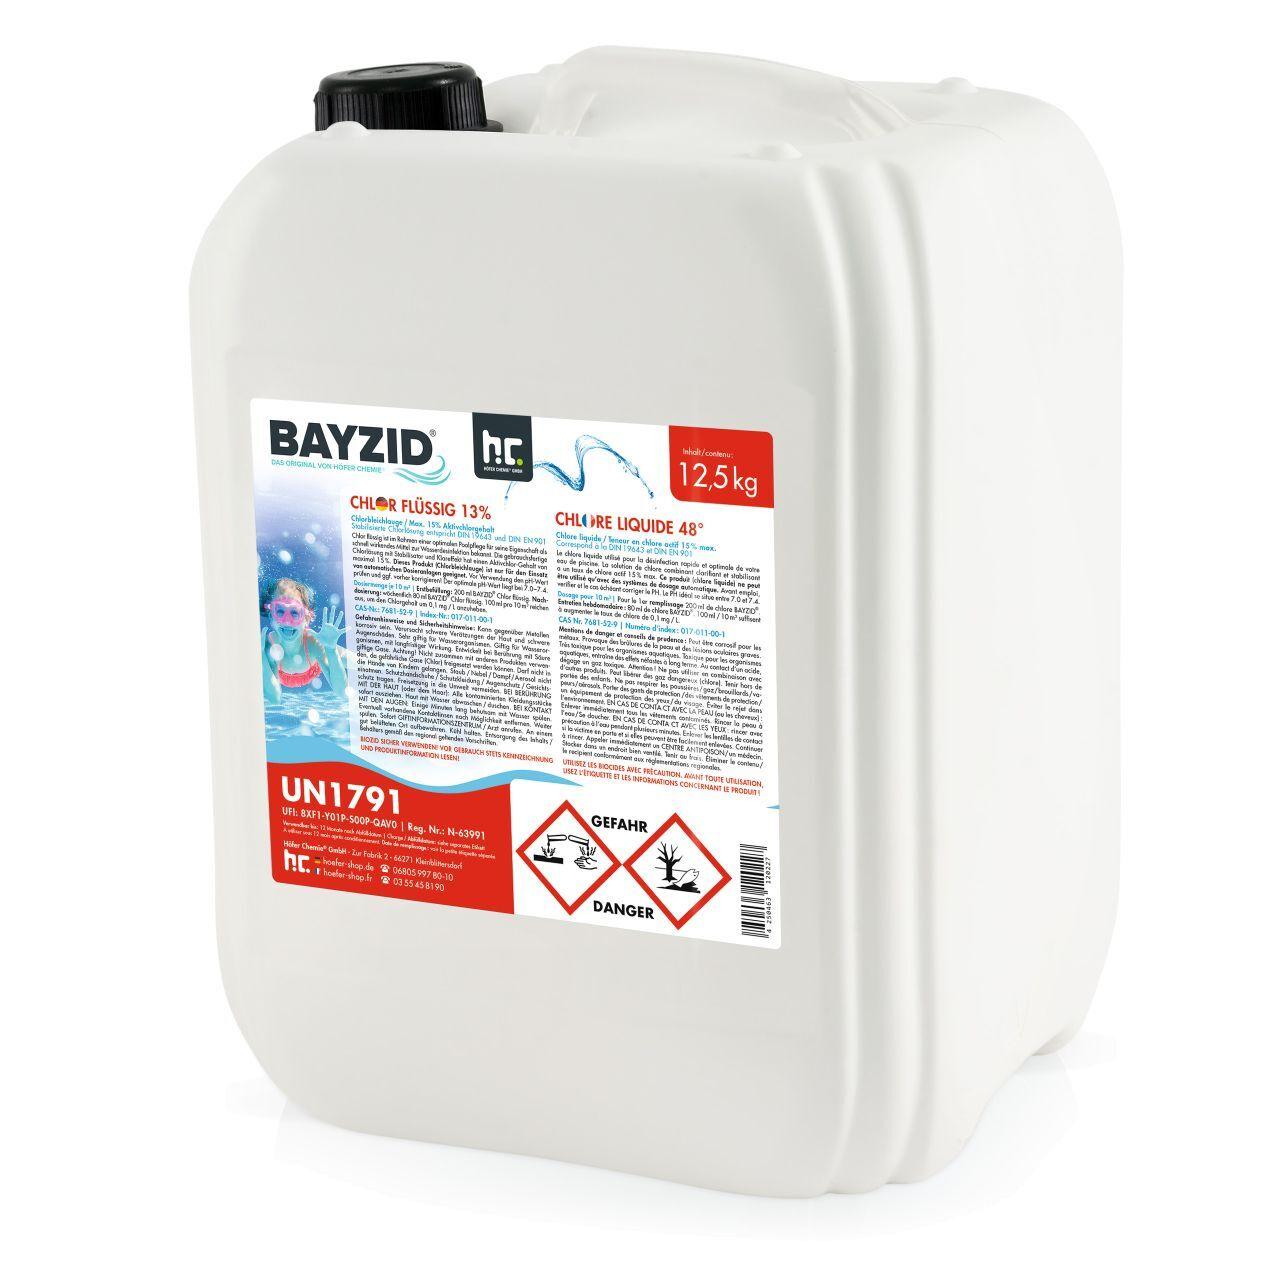 BAYZID 25 kg Bayzid® Chlore liquide 48° (2 x 12.5 kg)